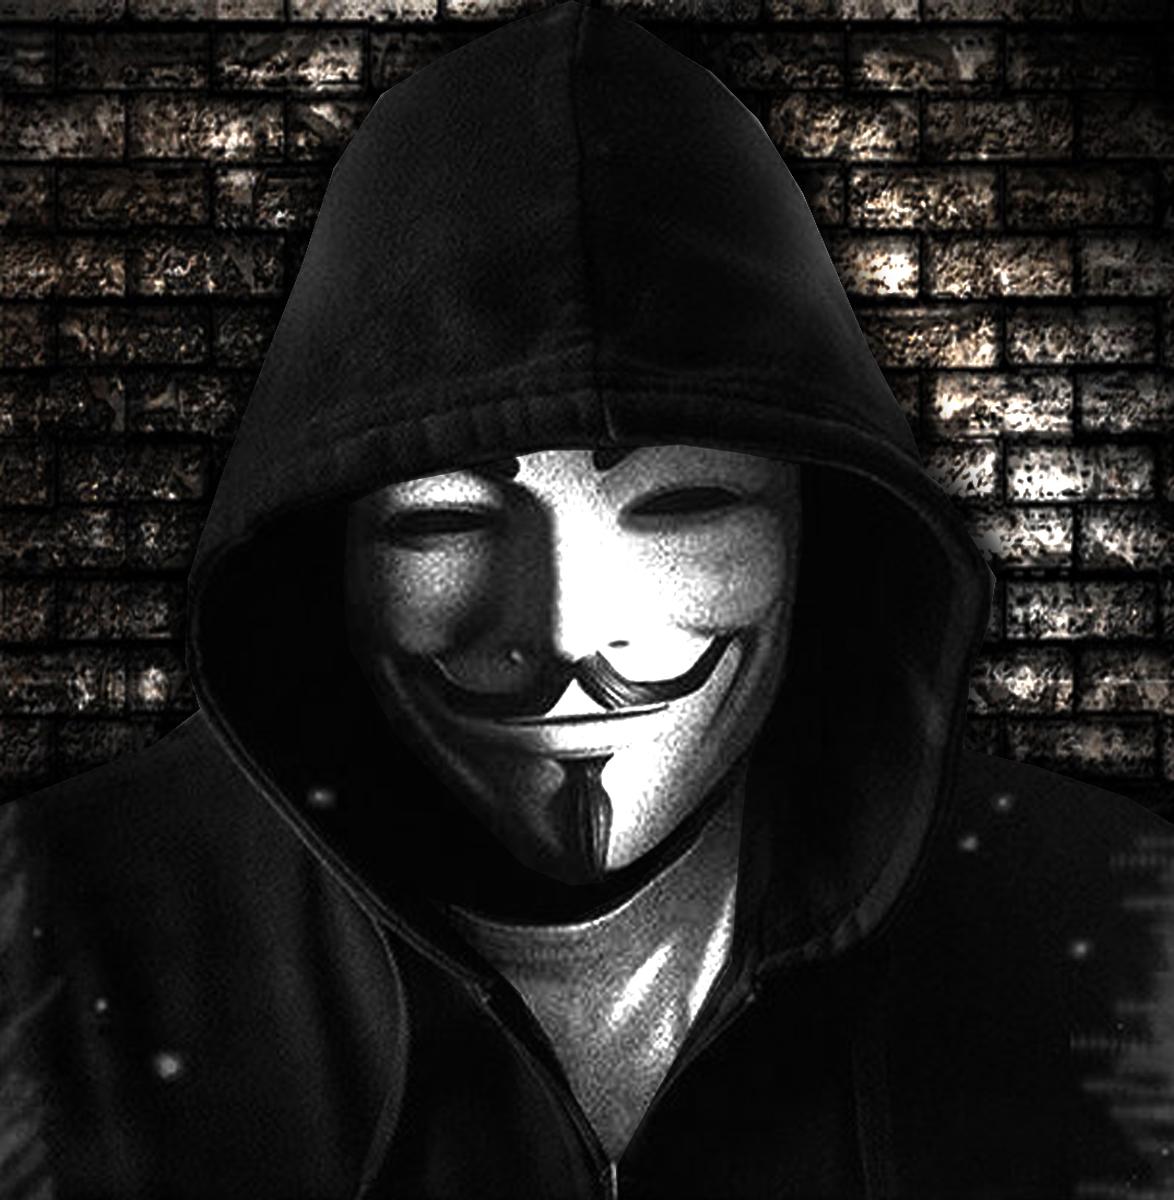 Anonymous Photo by TheDamDamBW12